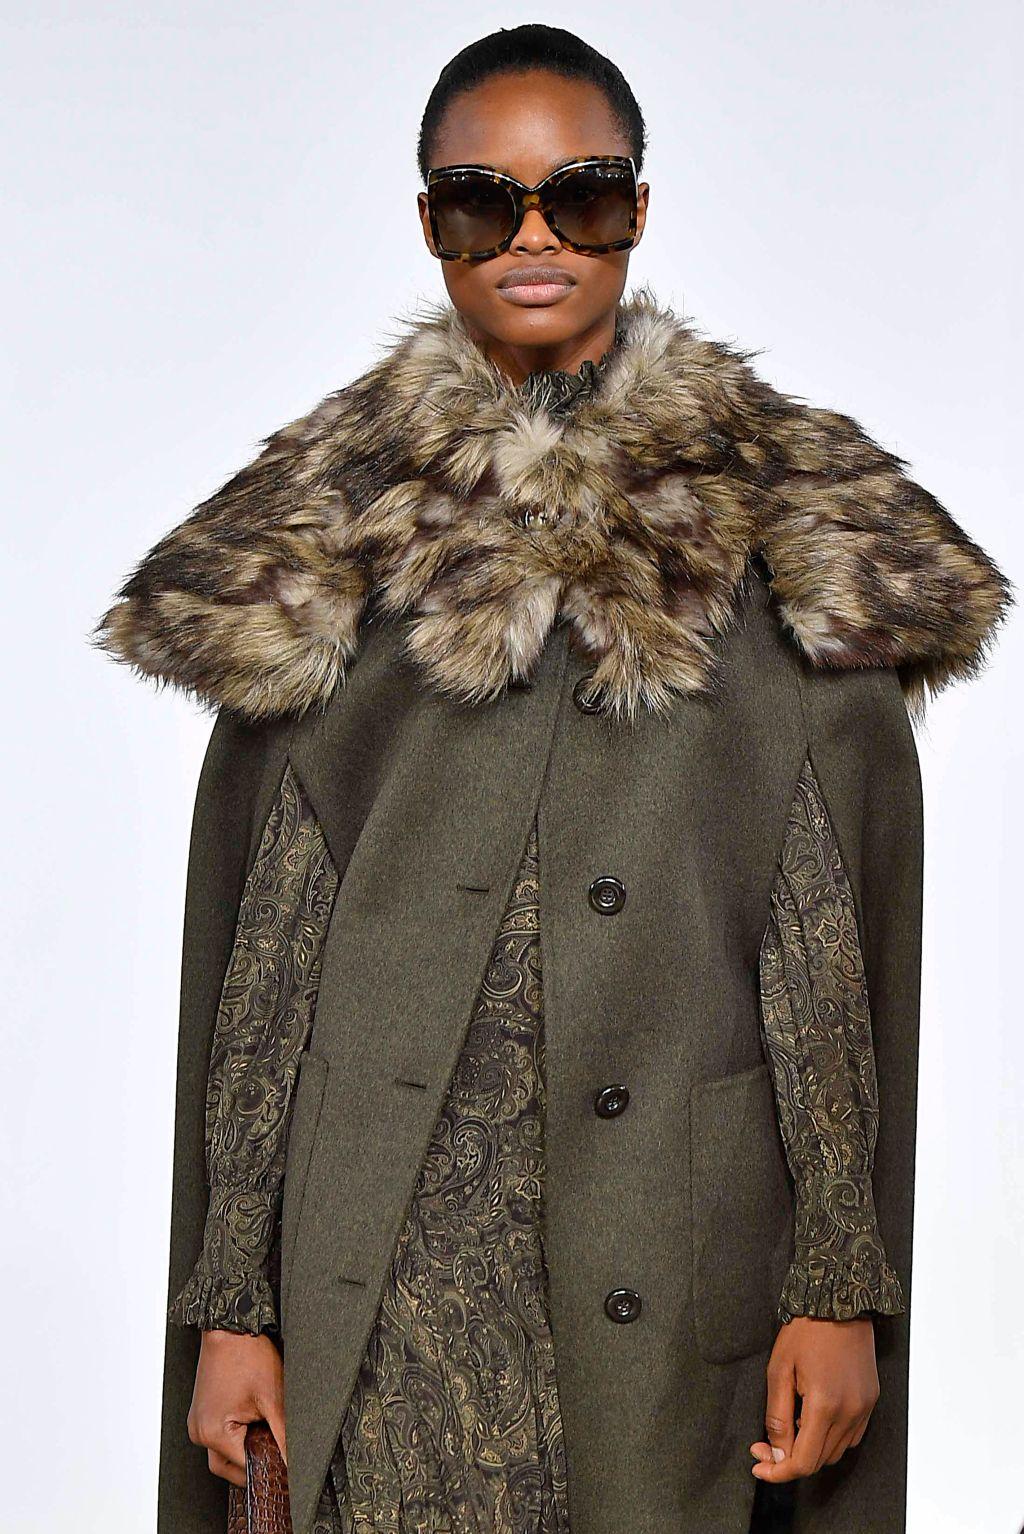 Michael Kors - Runway - February 2018 - New York Fashion Week